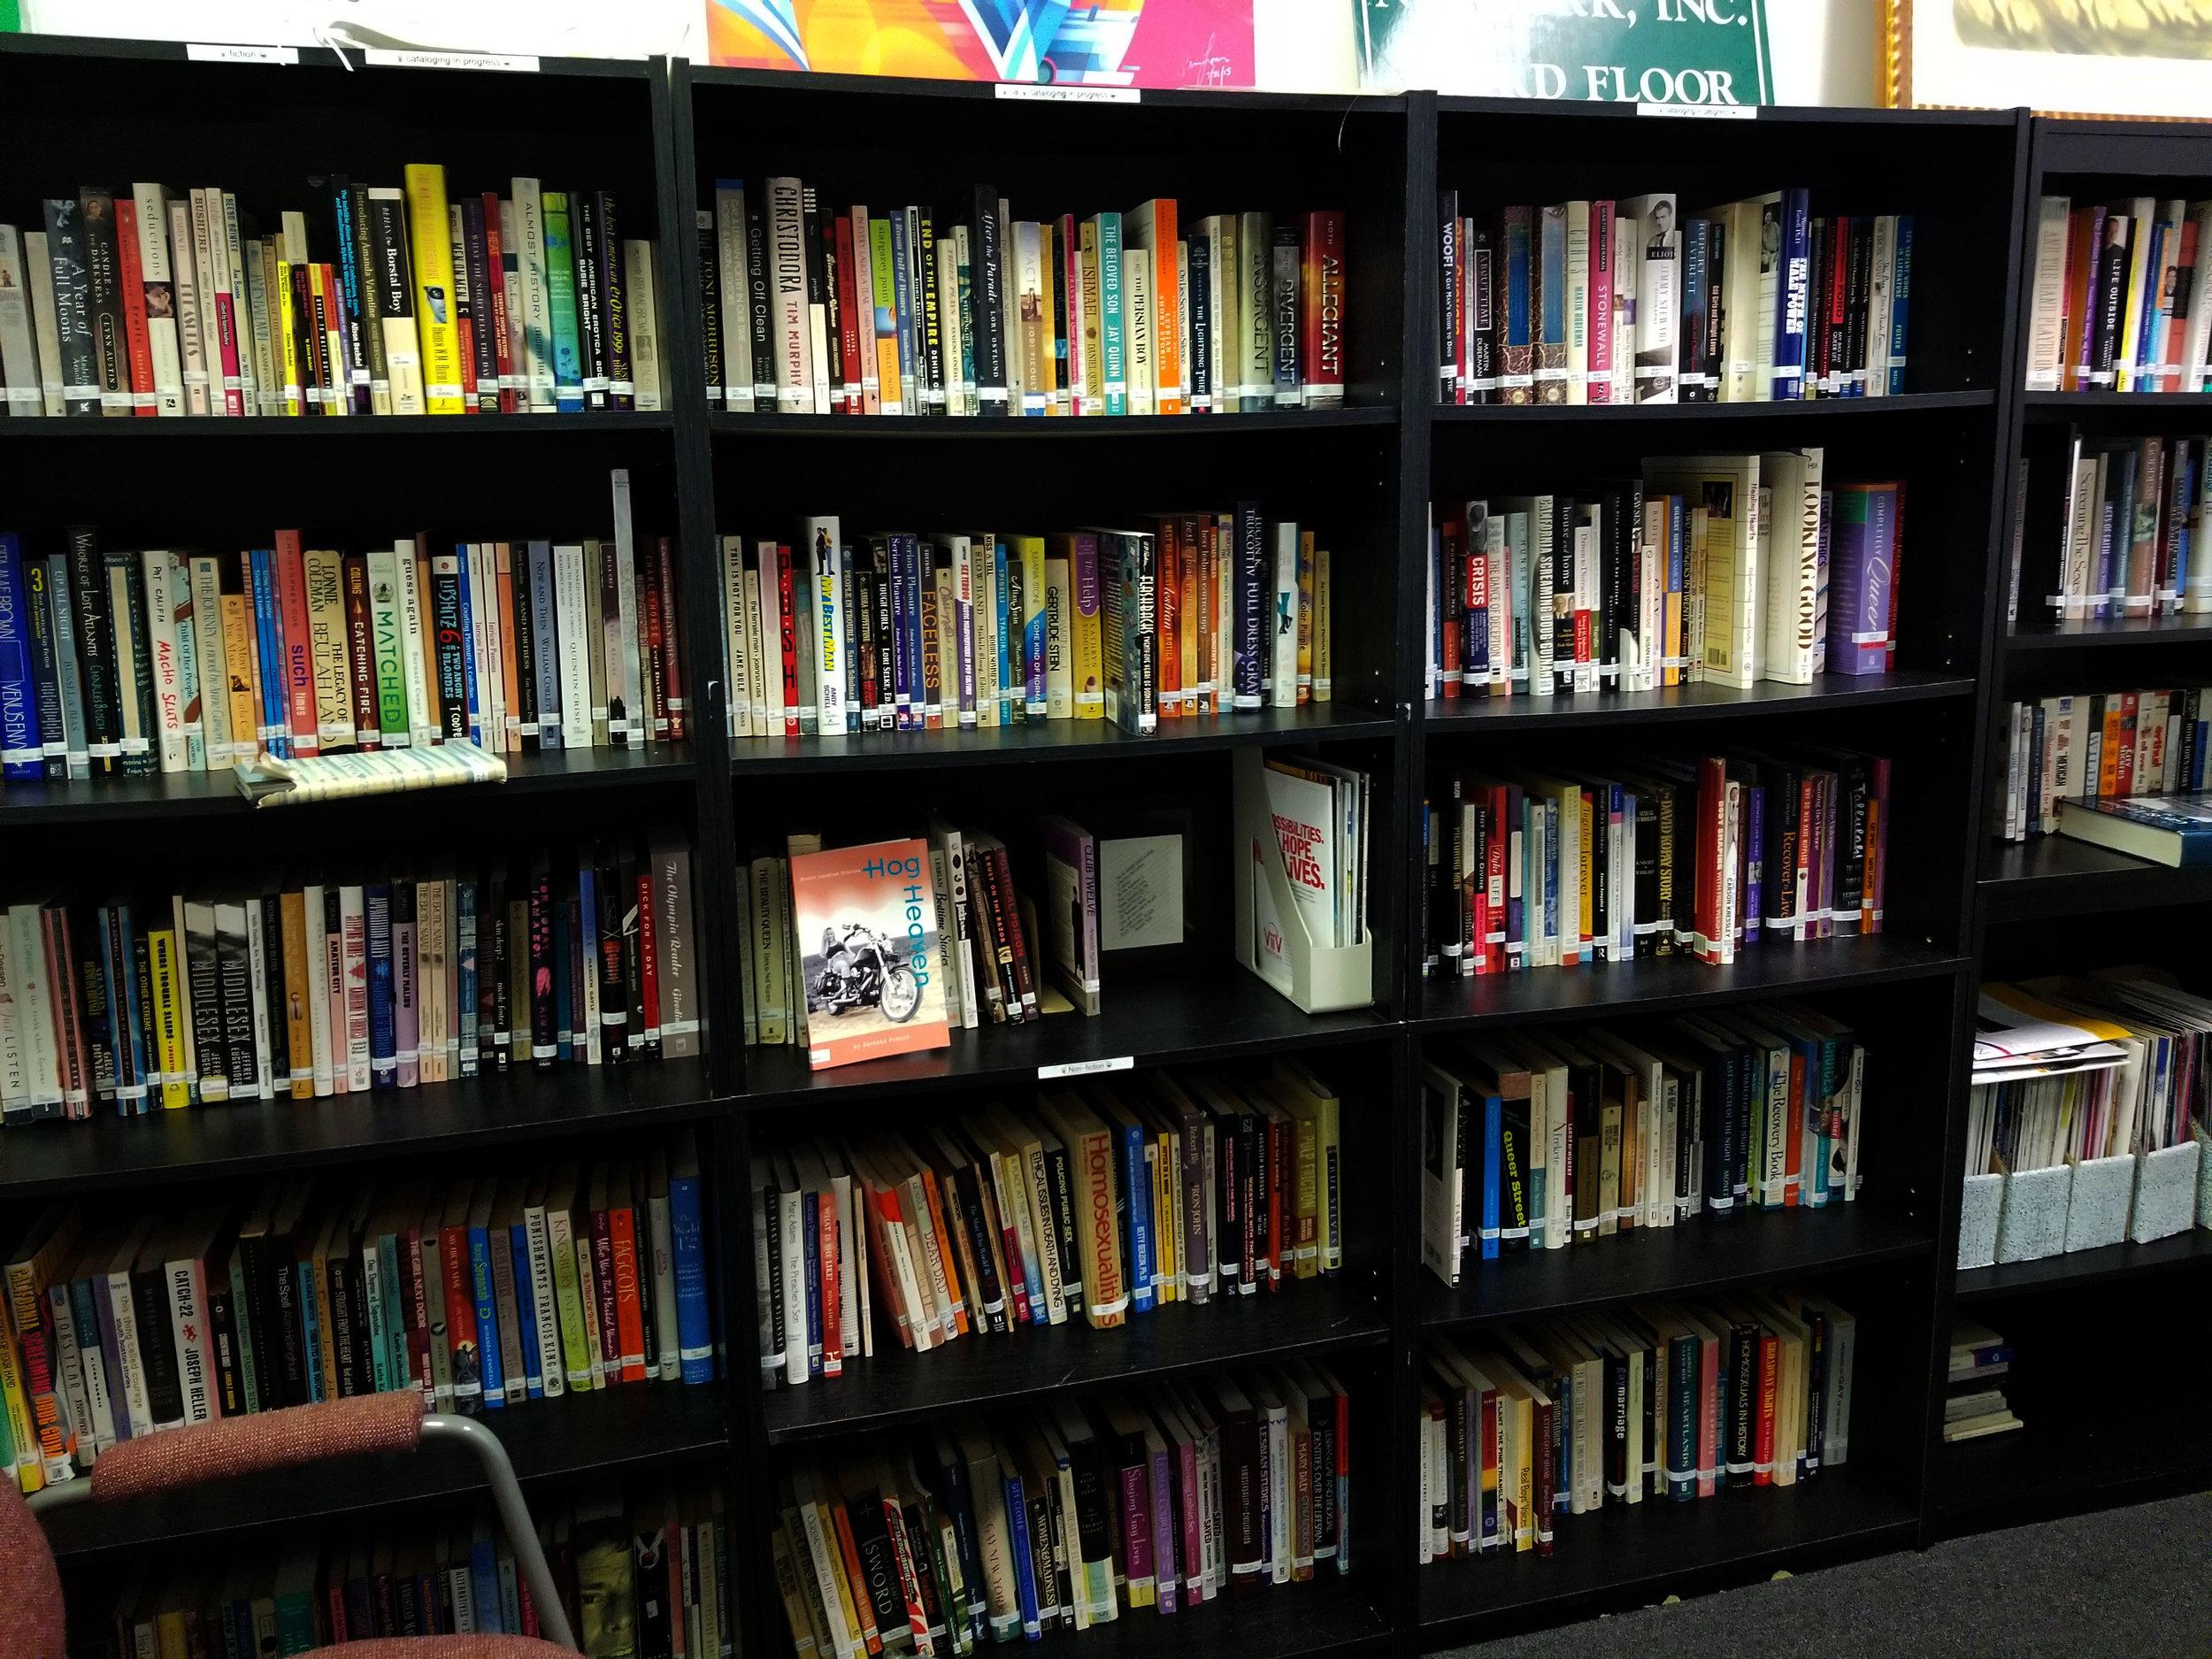 savannah-lgbtcenter-library-01.jpg